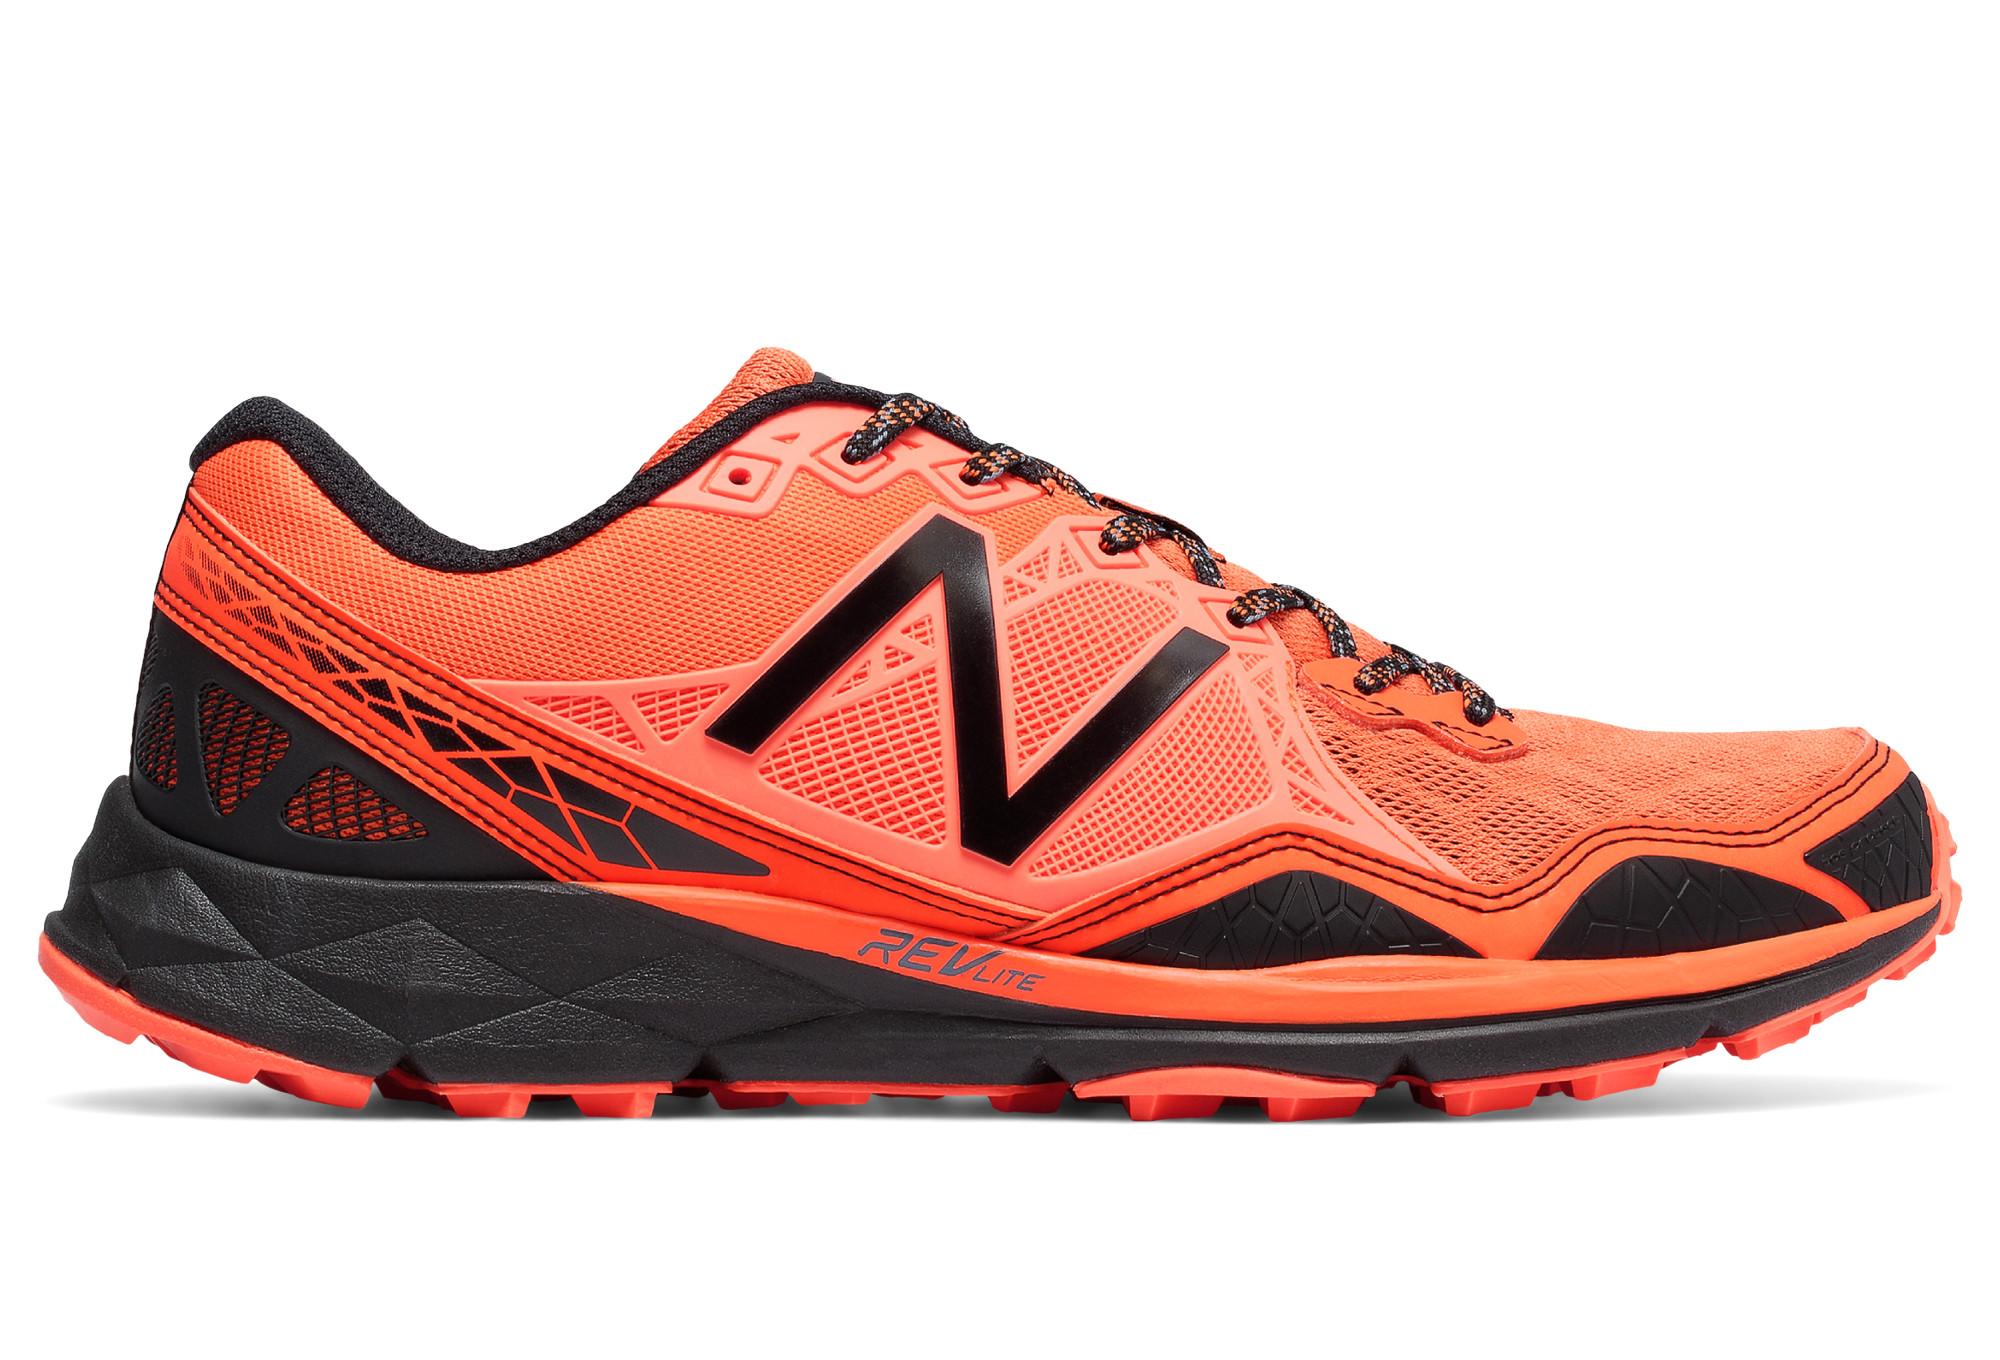 quality design 4109a f1232 Chaussures de Trail New Balance M Trail 910 V3 Orange   Noir